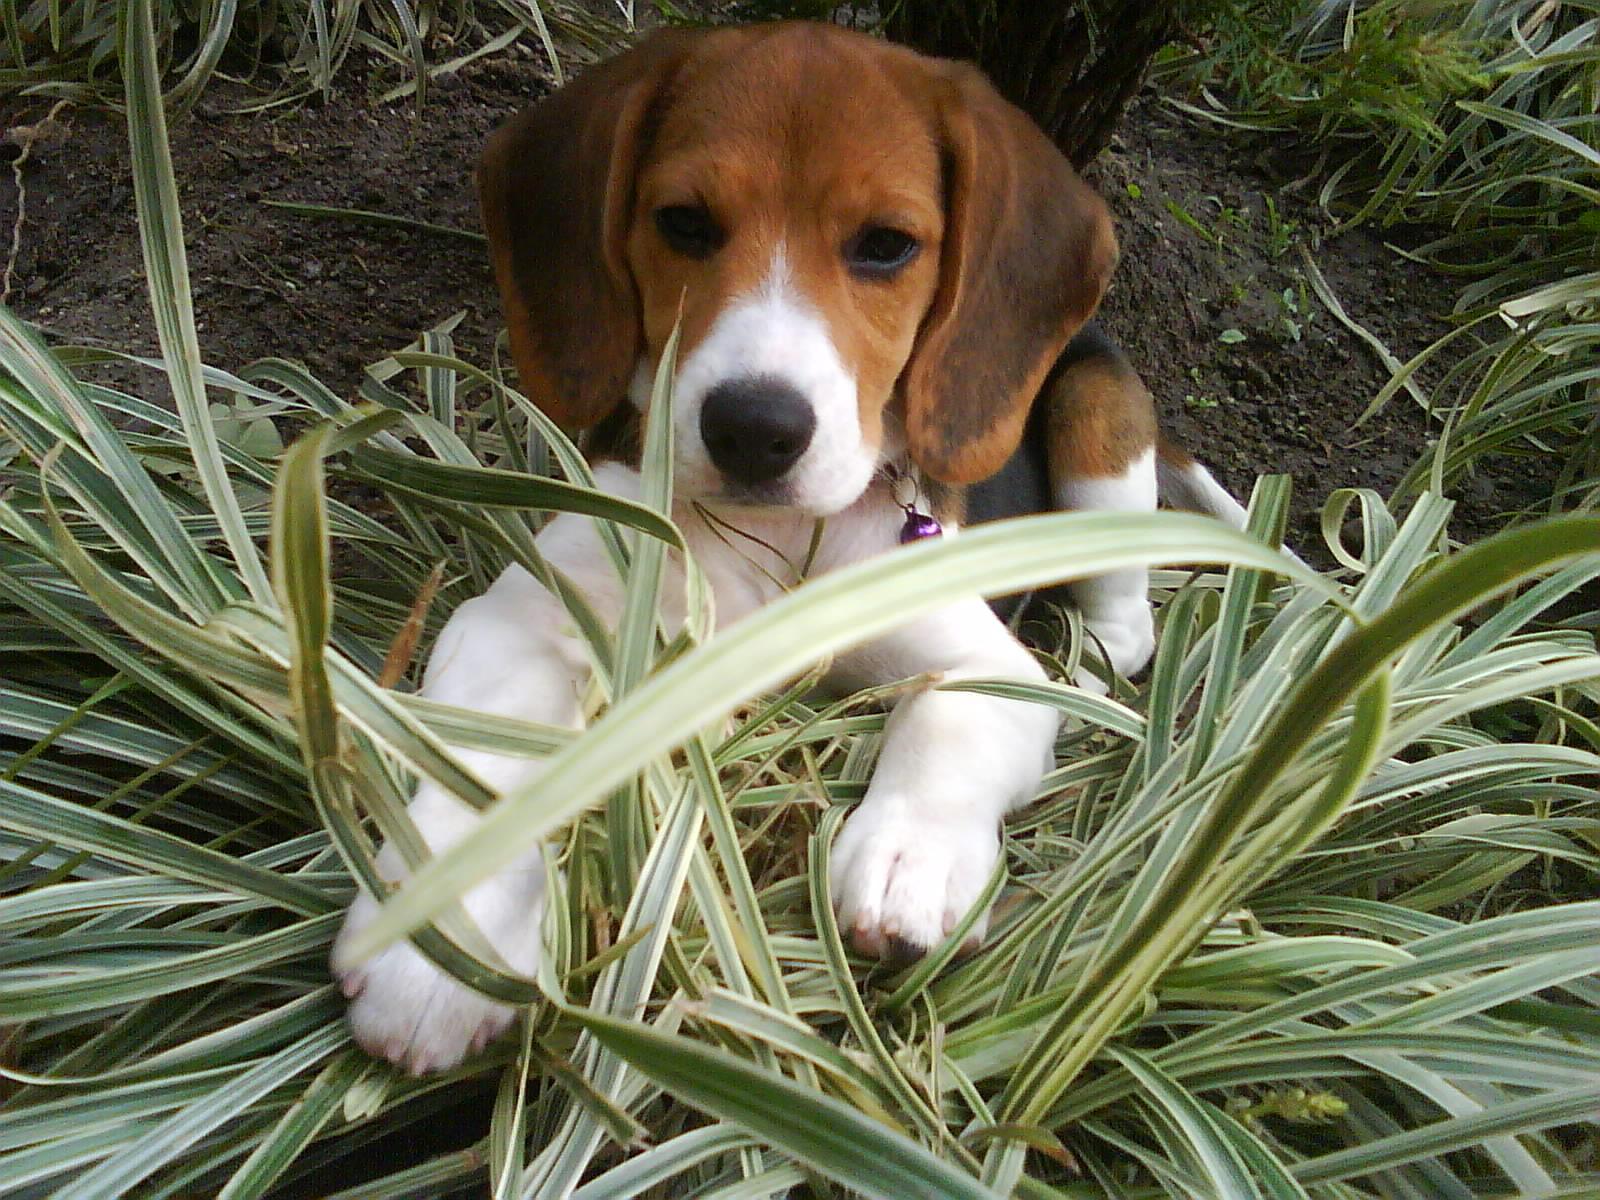 Ikbhal: beagle dogs